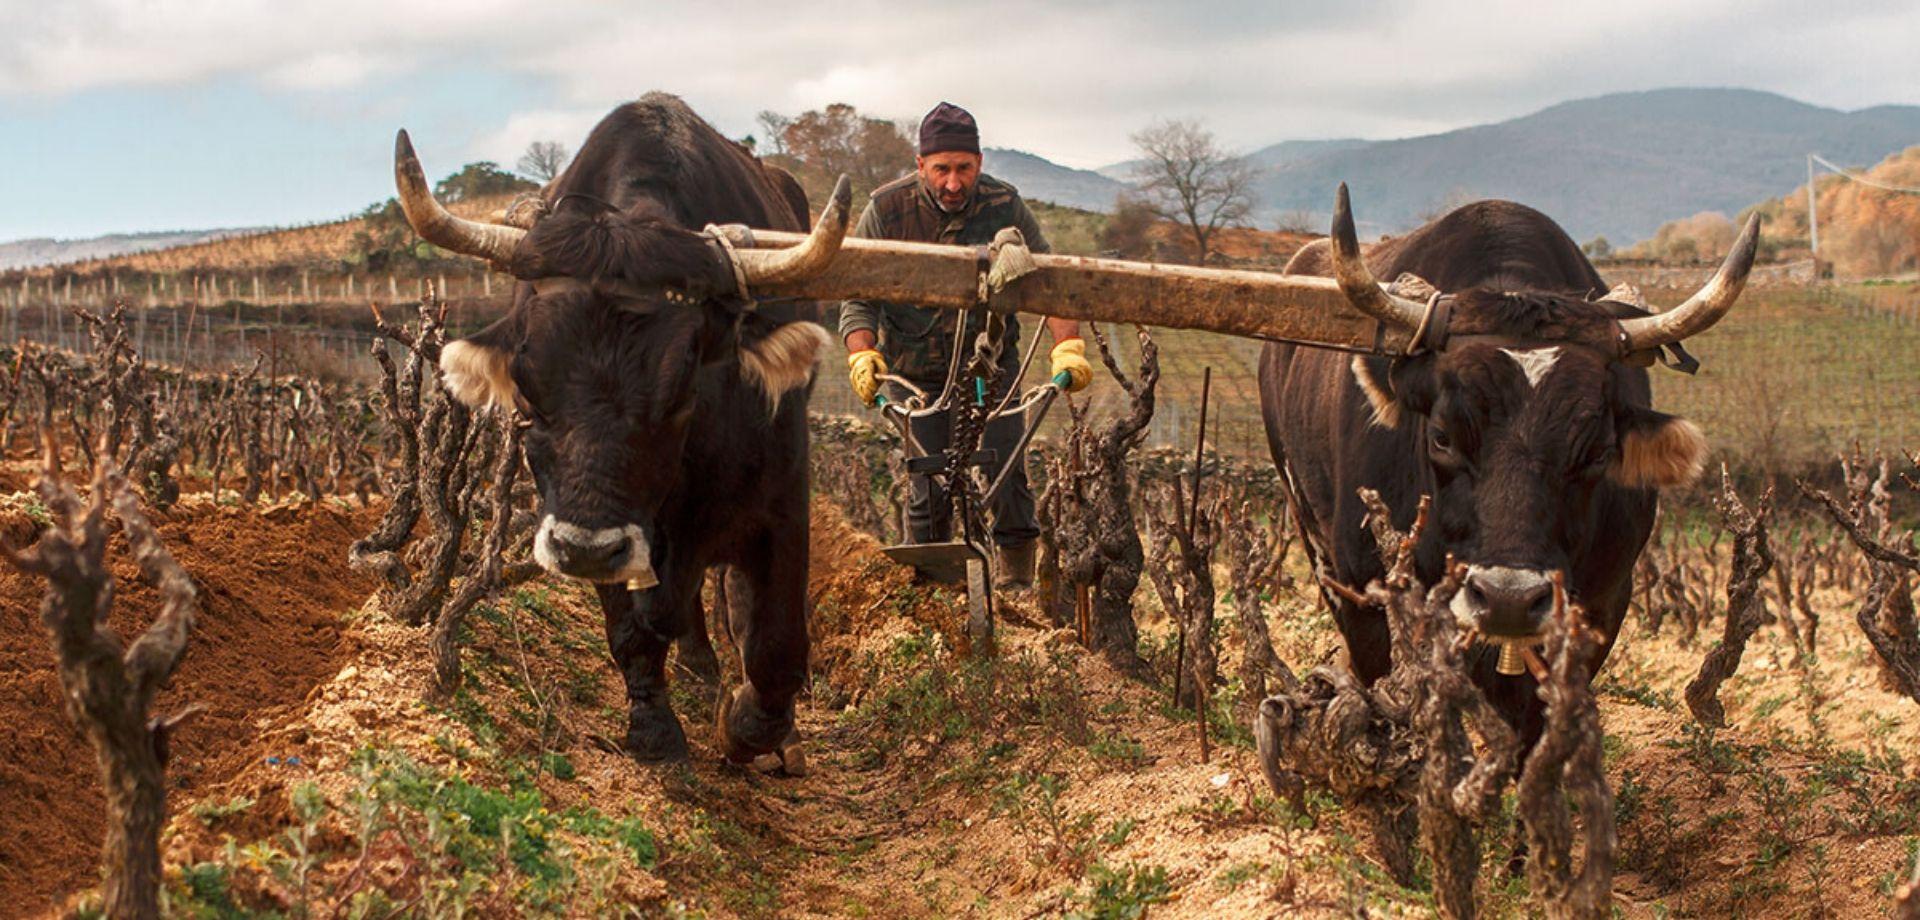 Tra i filari di uve Cannonau